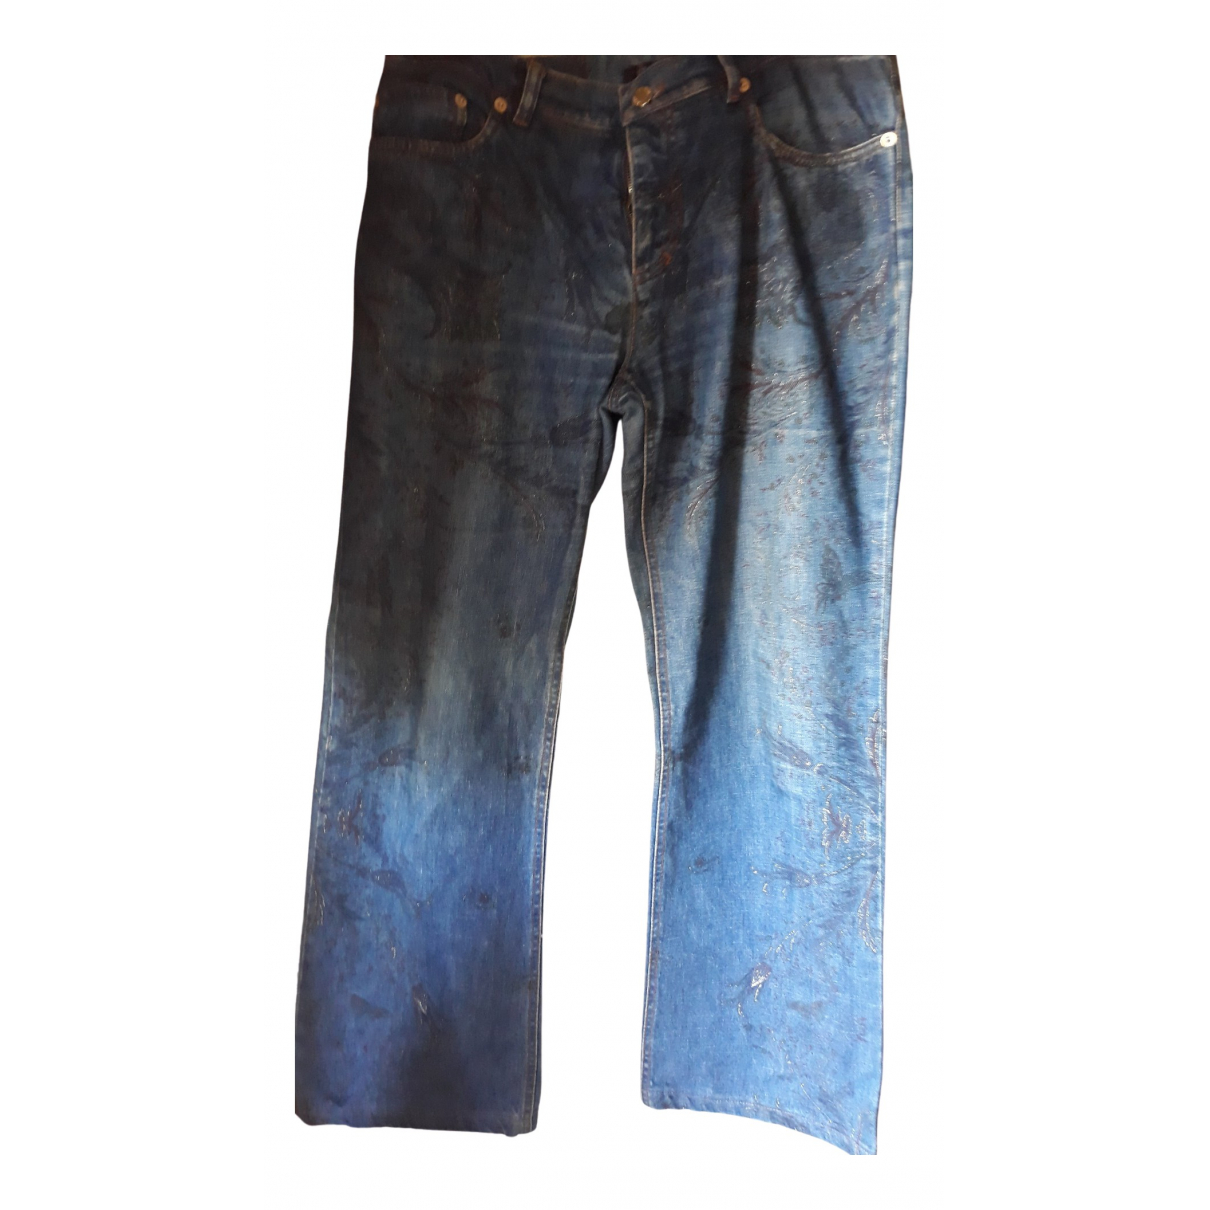 Roberto Cavalli \N Blue Denim - Jeans Trousers for Women 44 IT